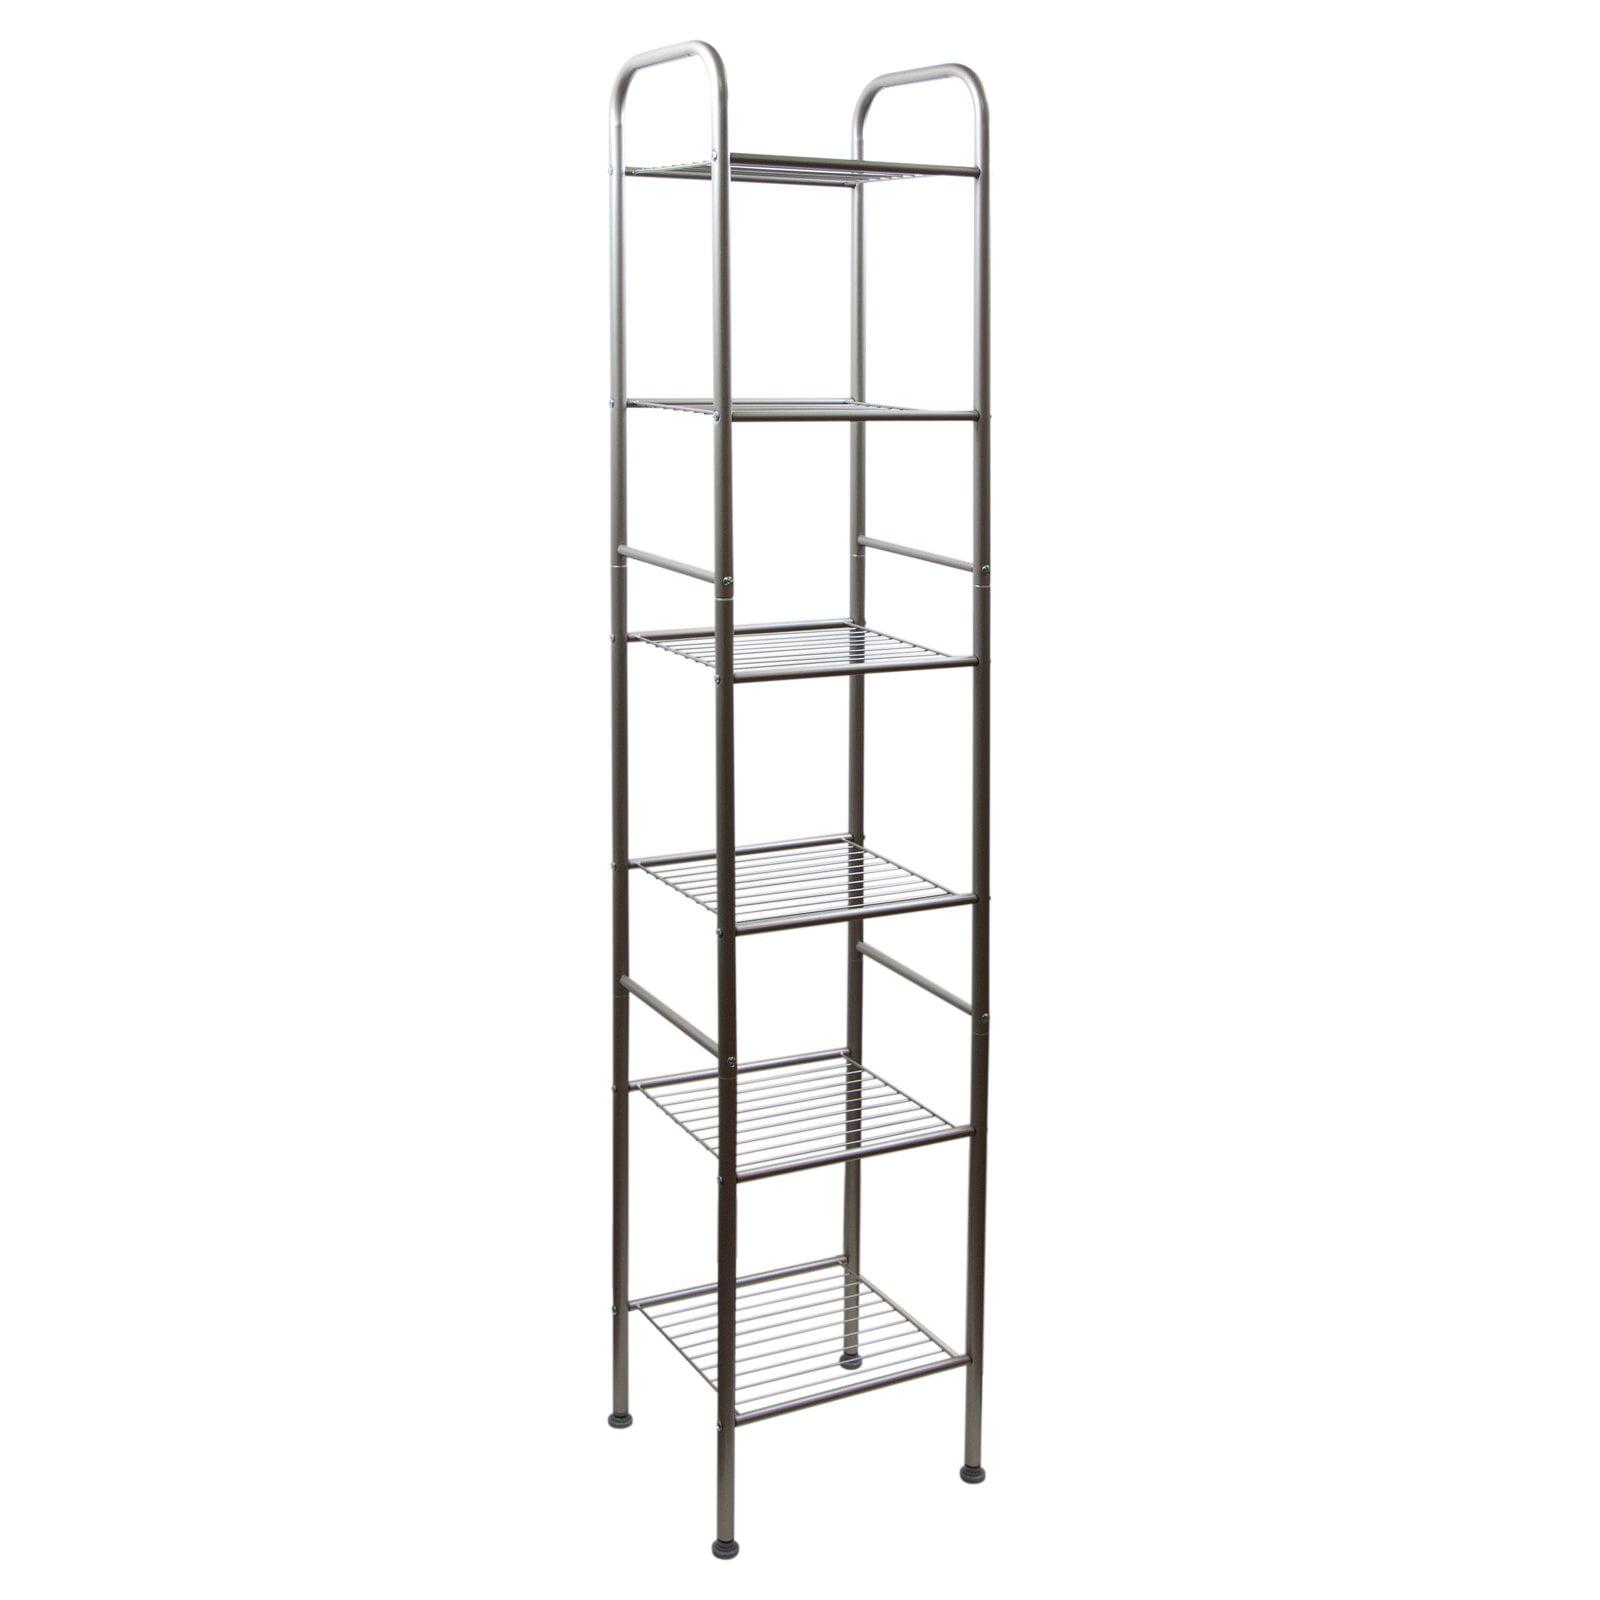 5 Tier Bathroom Shelving Unit Storage Rack Corner Shelf Organization Rack Tower